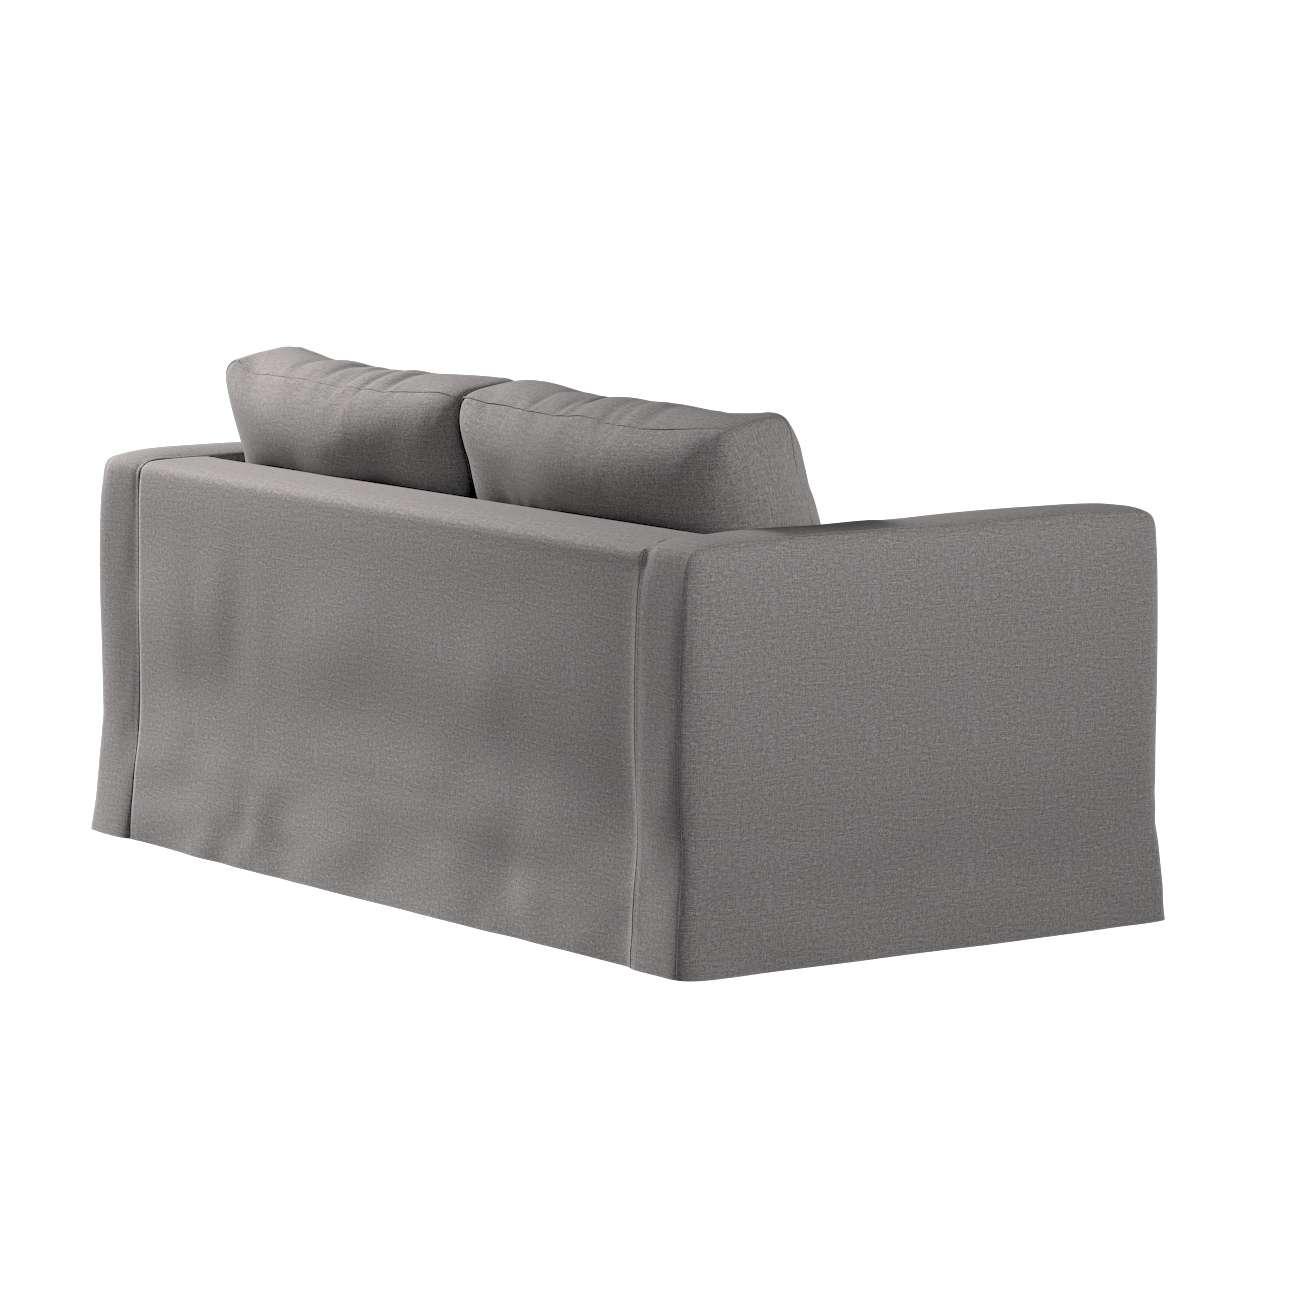 Floor length Karlstad 2-seater sofa cover in collection Edinburgh, fabric: 115-81